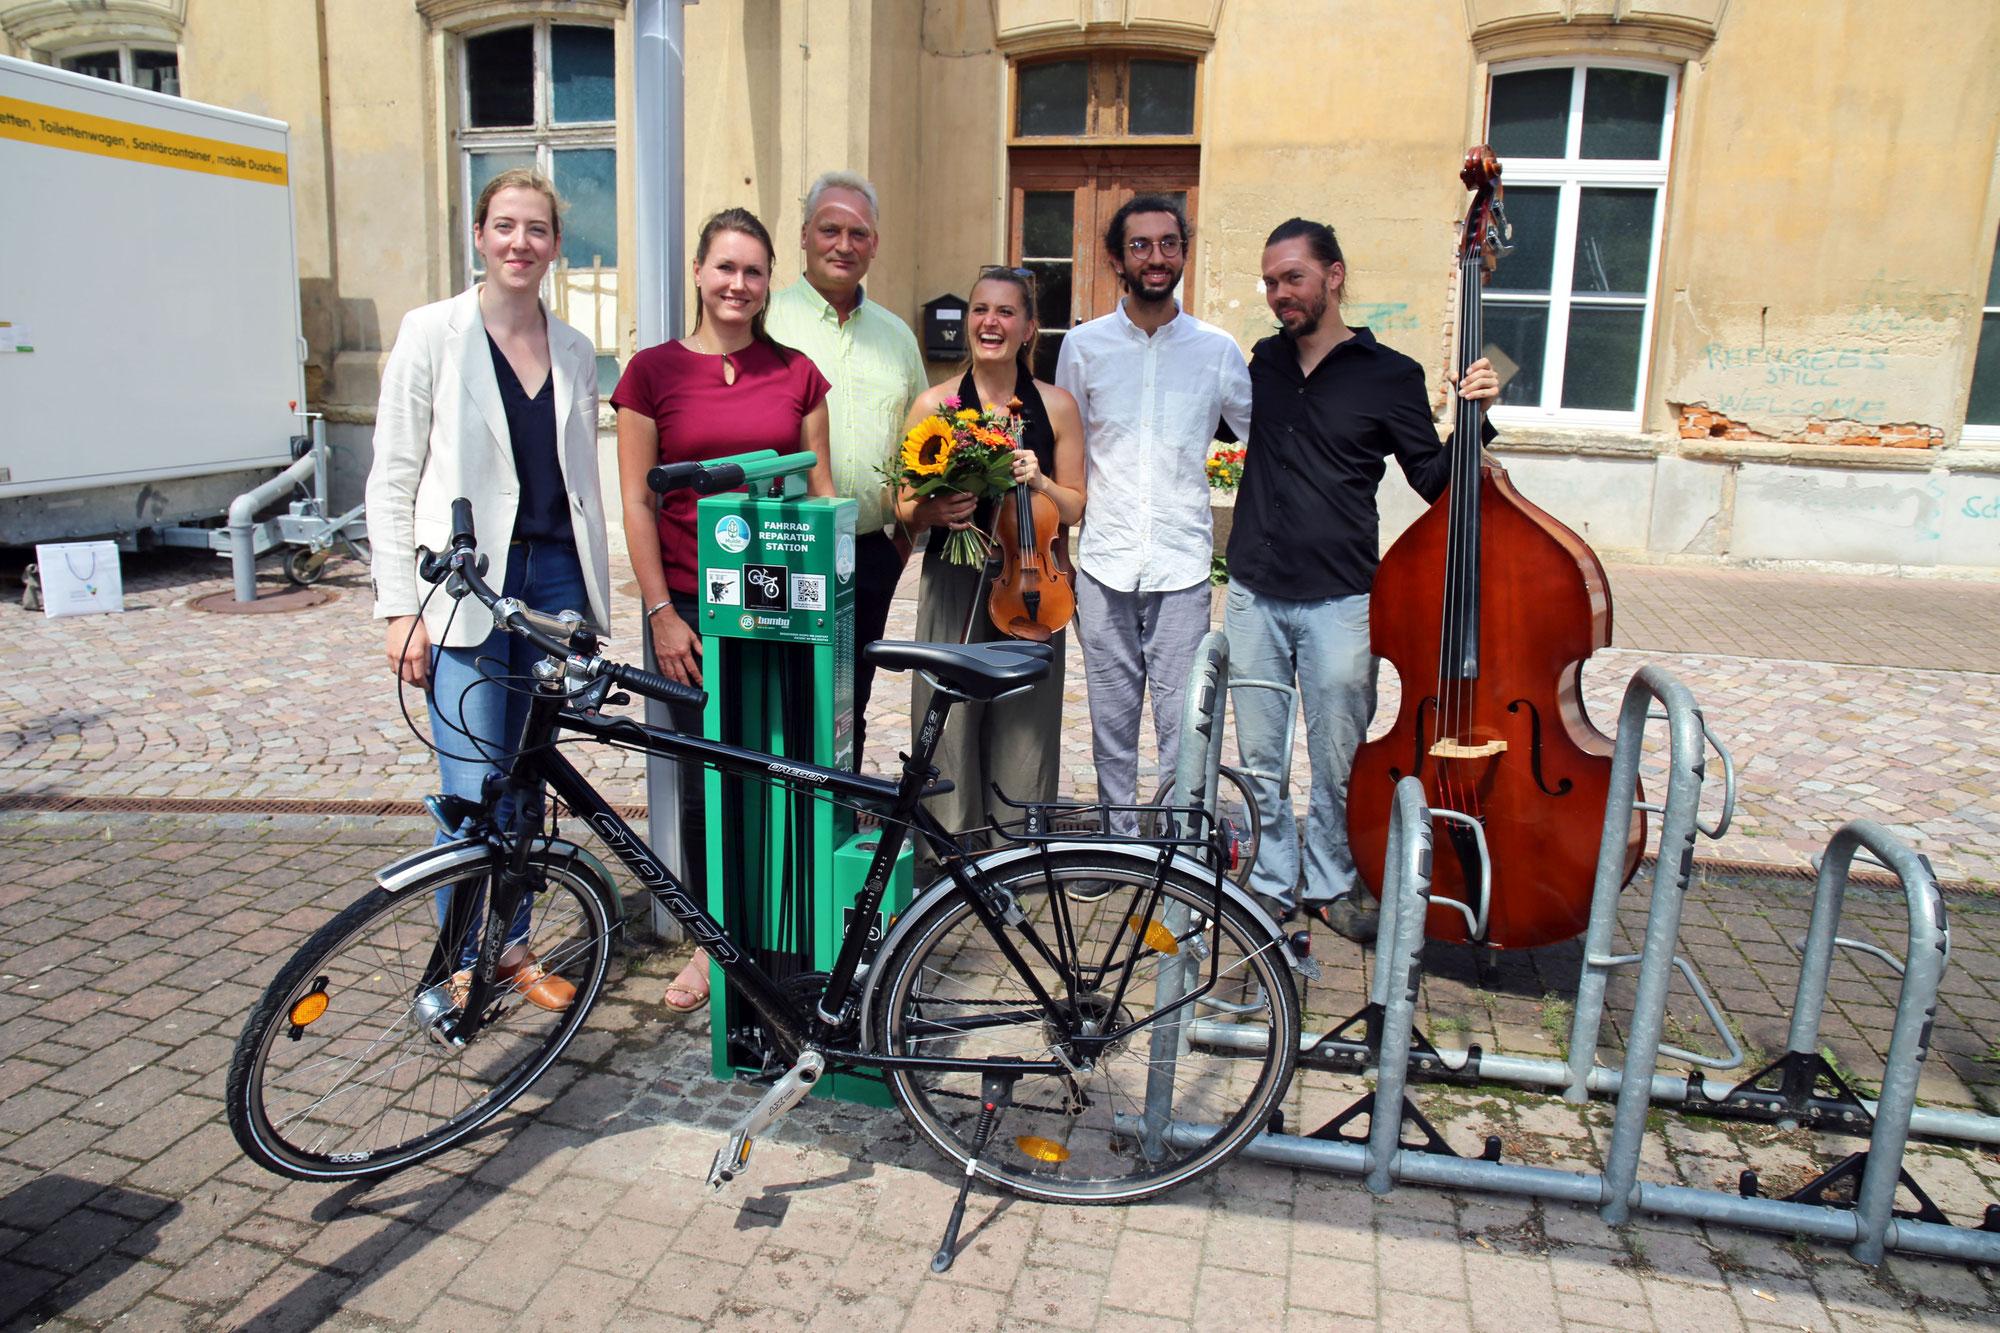 Dritte Fahrrad-Selbsthilfewerkstatt am Kulturbahnhof Leisnig eröffnet